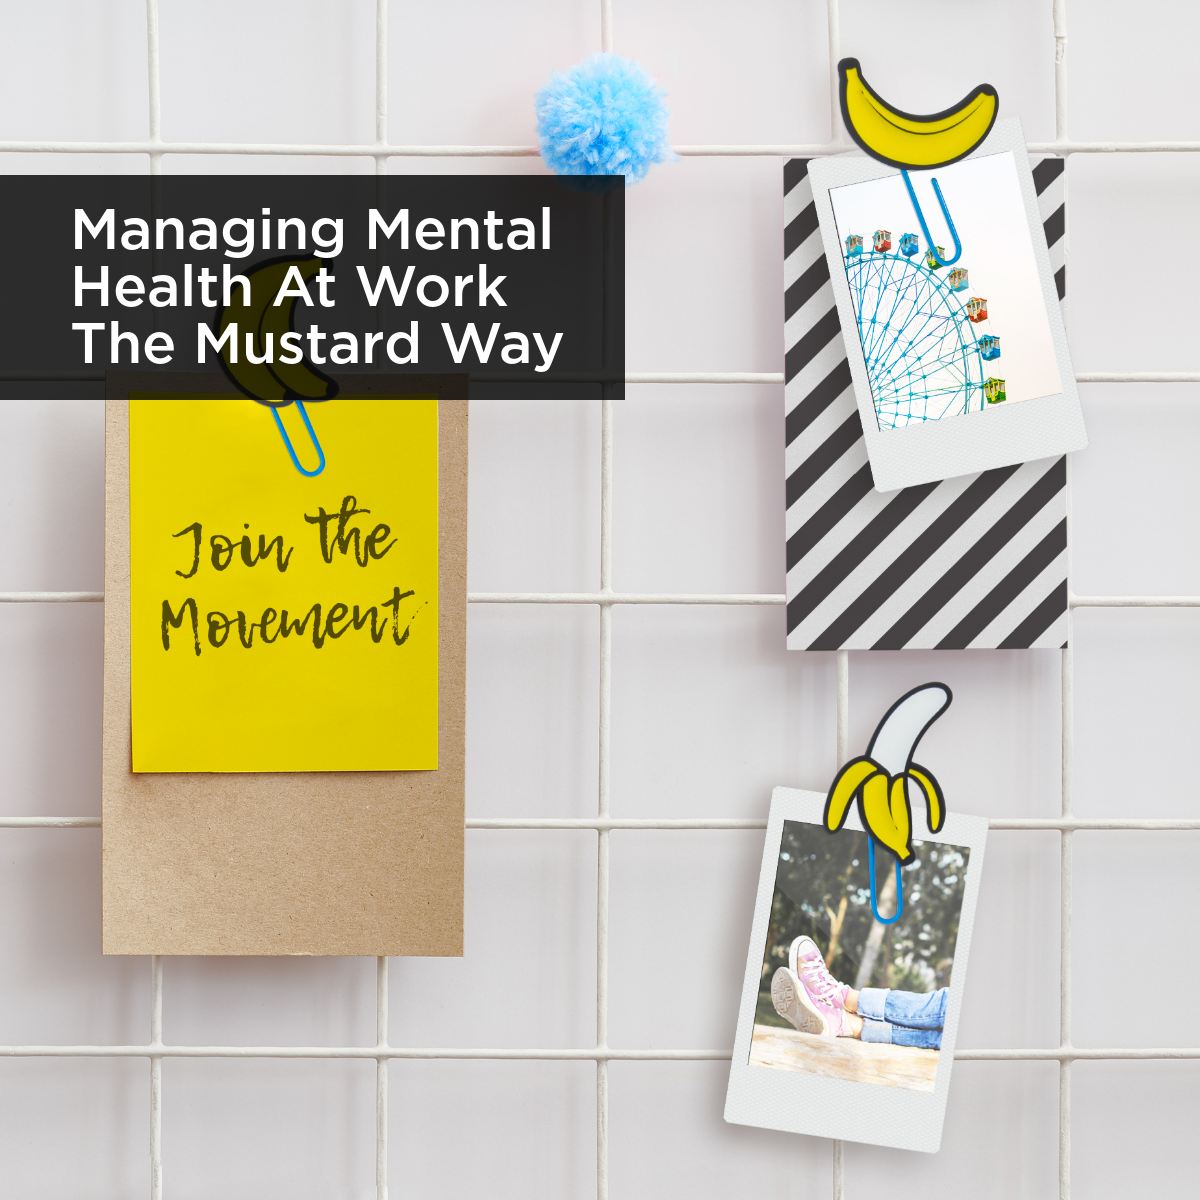 Managing Mental Health At Work The Mustard